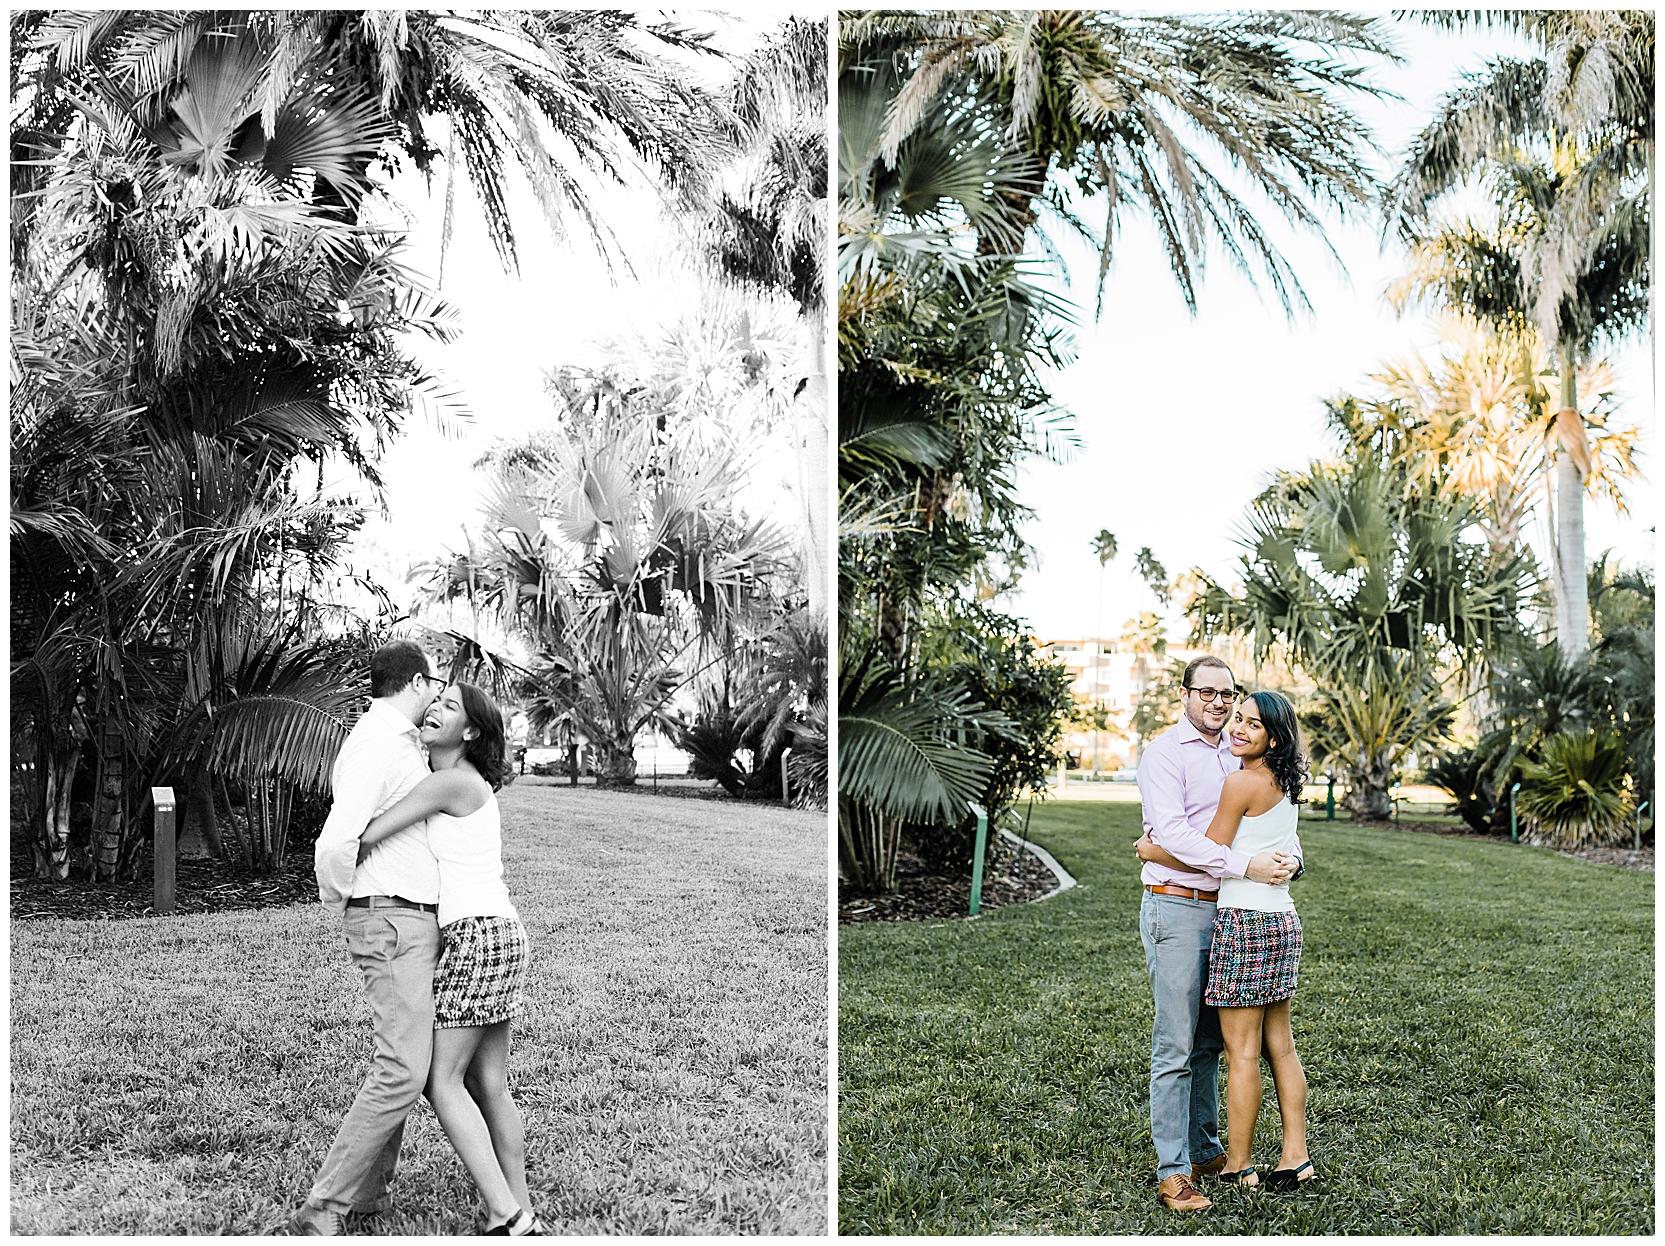 jessicafredericks_st petersburg_florida_downtown_engagement_palm trees_sunset_brewery_0017.jpg